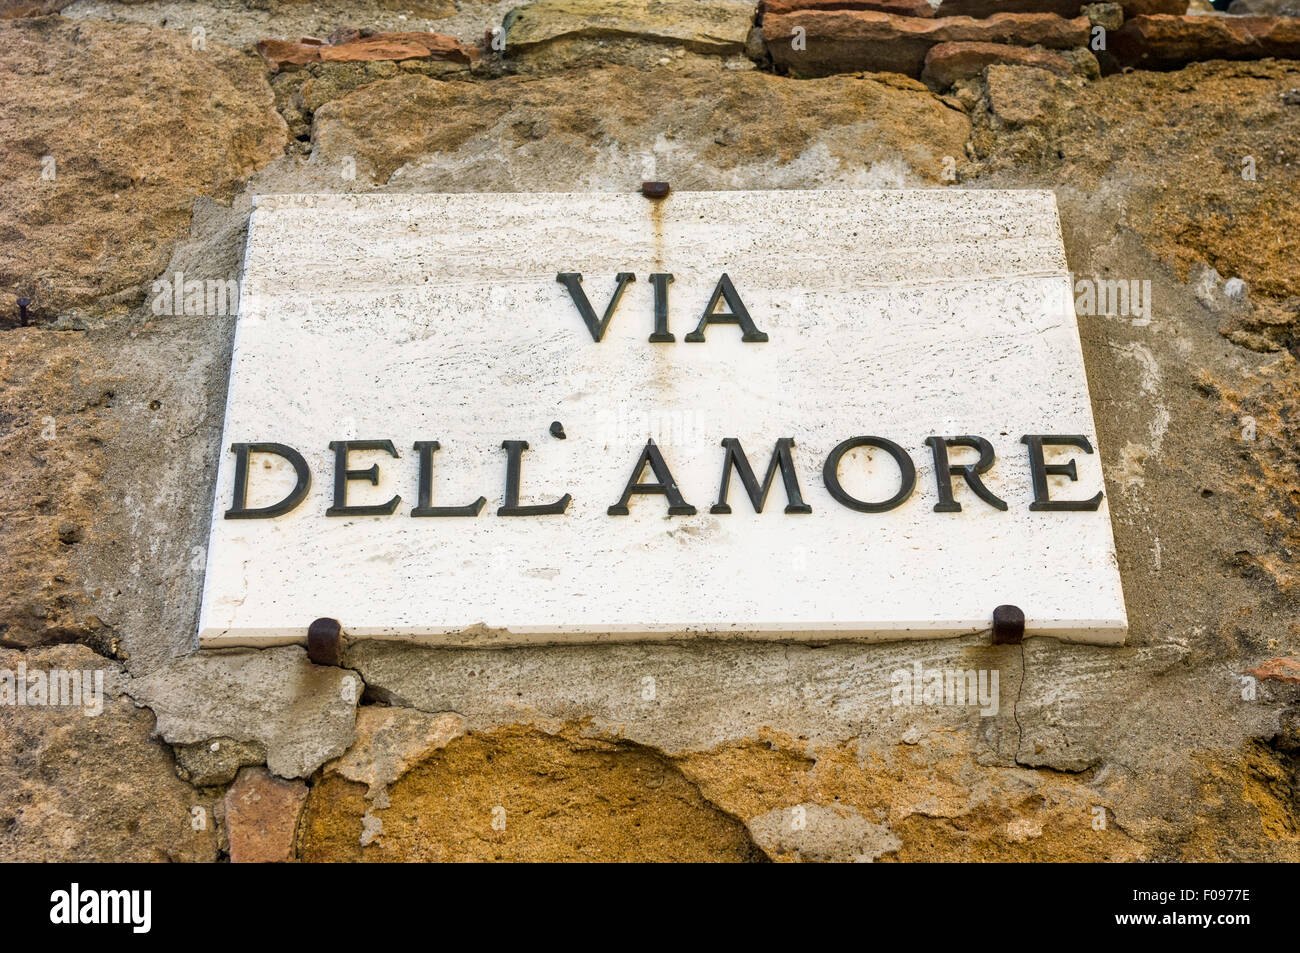 Pienza, Tuscany, Italy. Via dell' amore sign on wall. - Stock Image